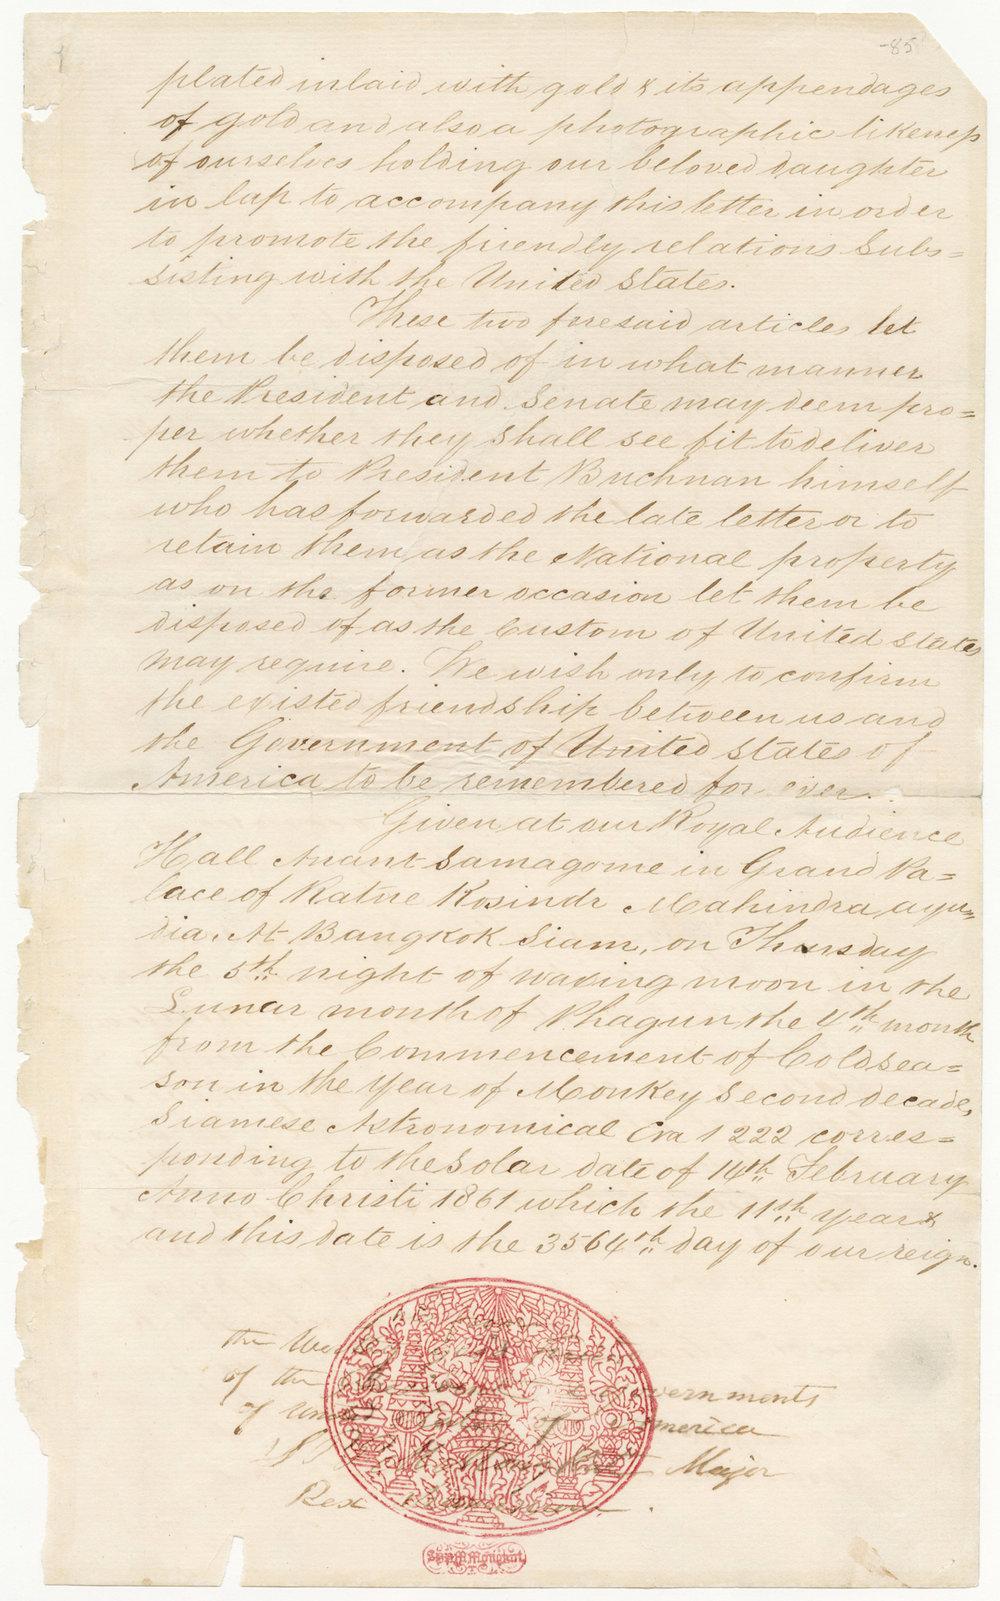 Letter from King Mongkut to President James Buchanan (excerpt), 1861 Courtesy of the National Archives and Records Administration, General Records of the United States Government; 6923530  พระราชสาส์นในพระบาทสมเด็จพระจอมเกล้าเจ้าอยู่หัว พระราชทานแก่ประธานาธิบดีเจมส์ บูแคนัน (ตัดมาบางส่วน) พ.ศ. ๒๔๐๔ ได้รับความอนุเคราะห์จากแผนกบันทึกทั่วไปของรัฐบาลสหรัฐอเมริกา องค์การบริหารจดหมายเหตุและบันทึกแห่งชาติ; 6923530